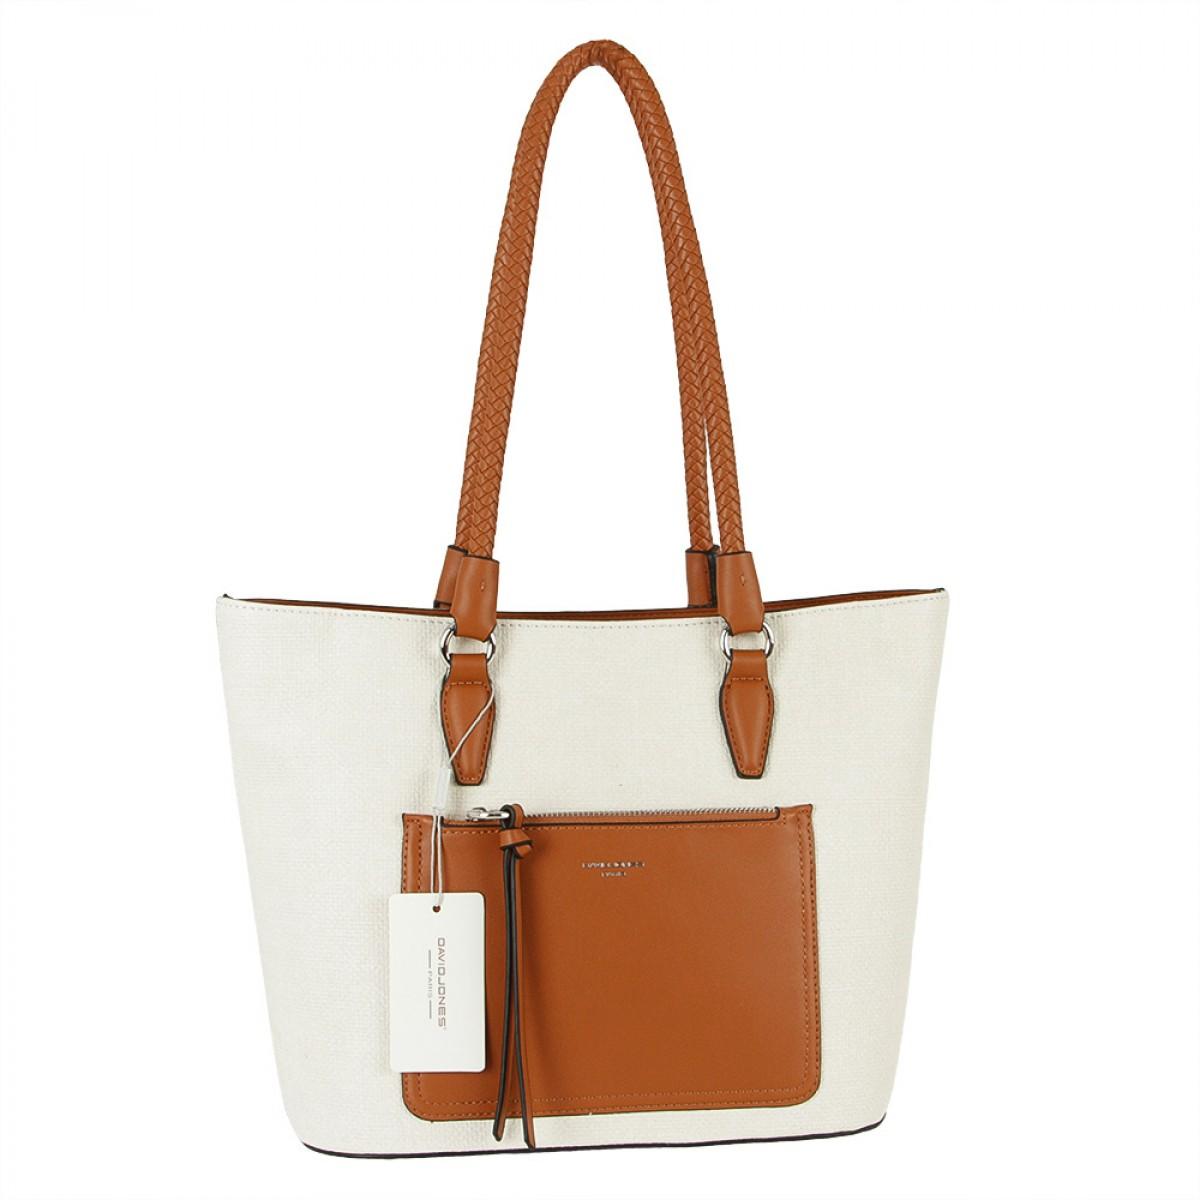 Жіноча сумка David Jones 6320-2 CREAMY WHITE